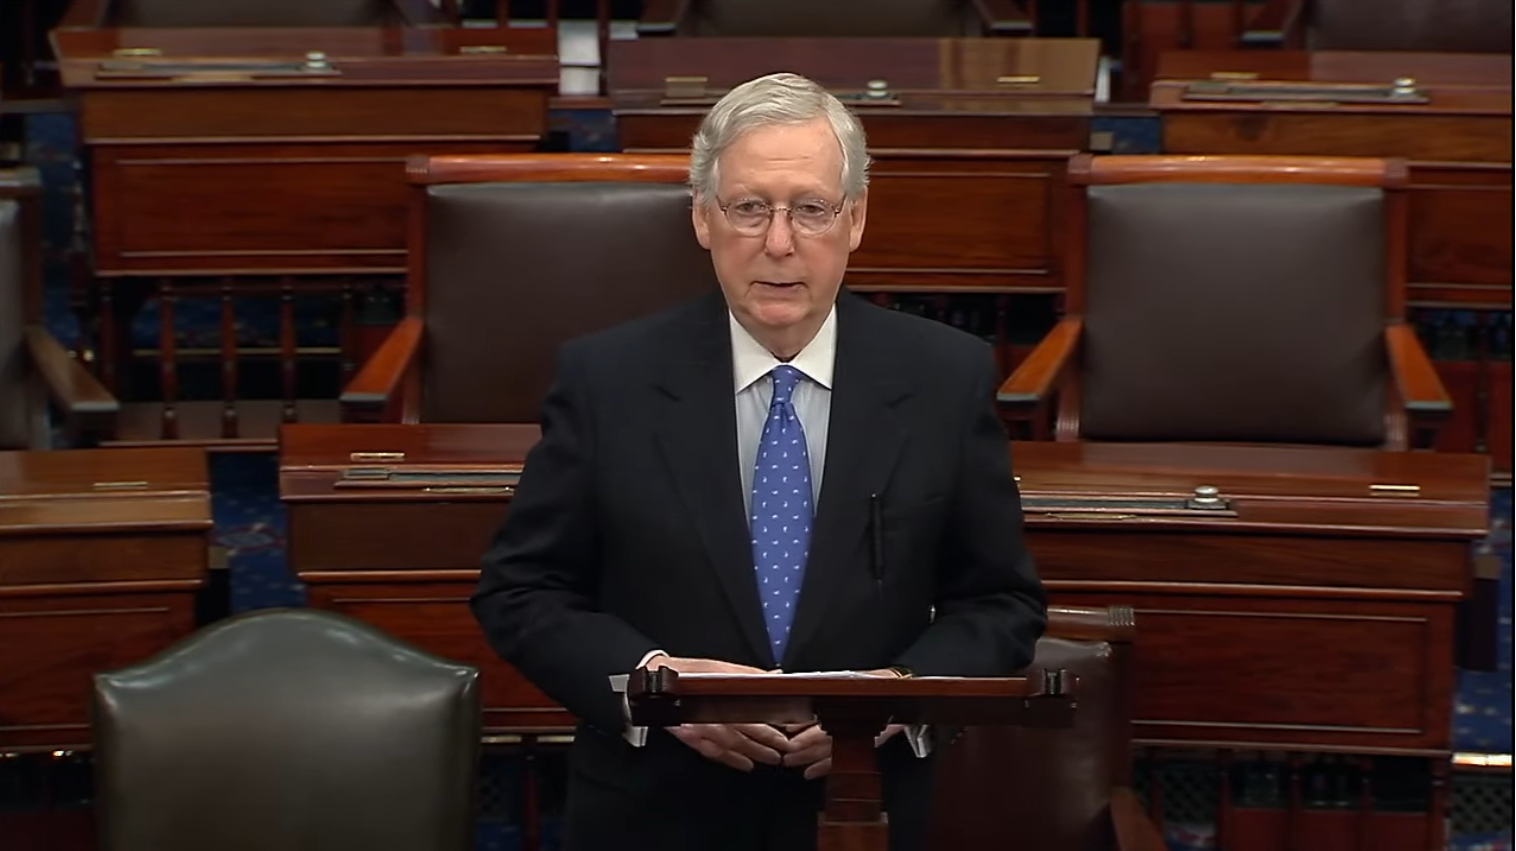 Senate Majority Leader Mitch McConnell Slams House Democrats' Impeachment Hoax